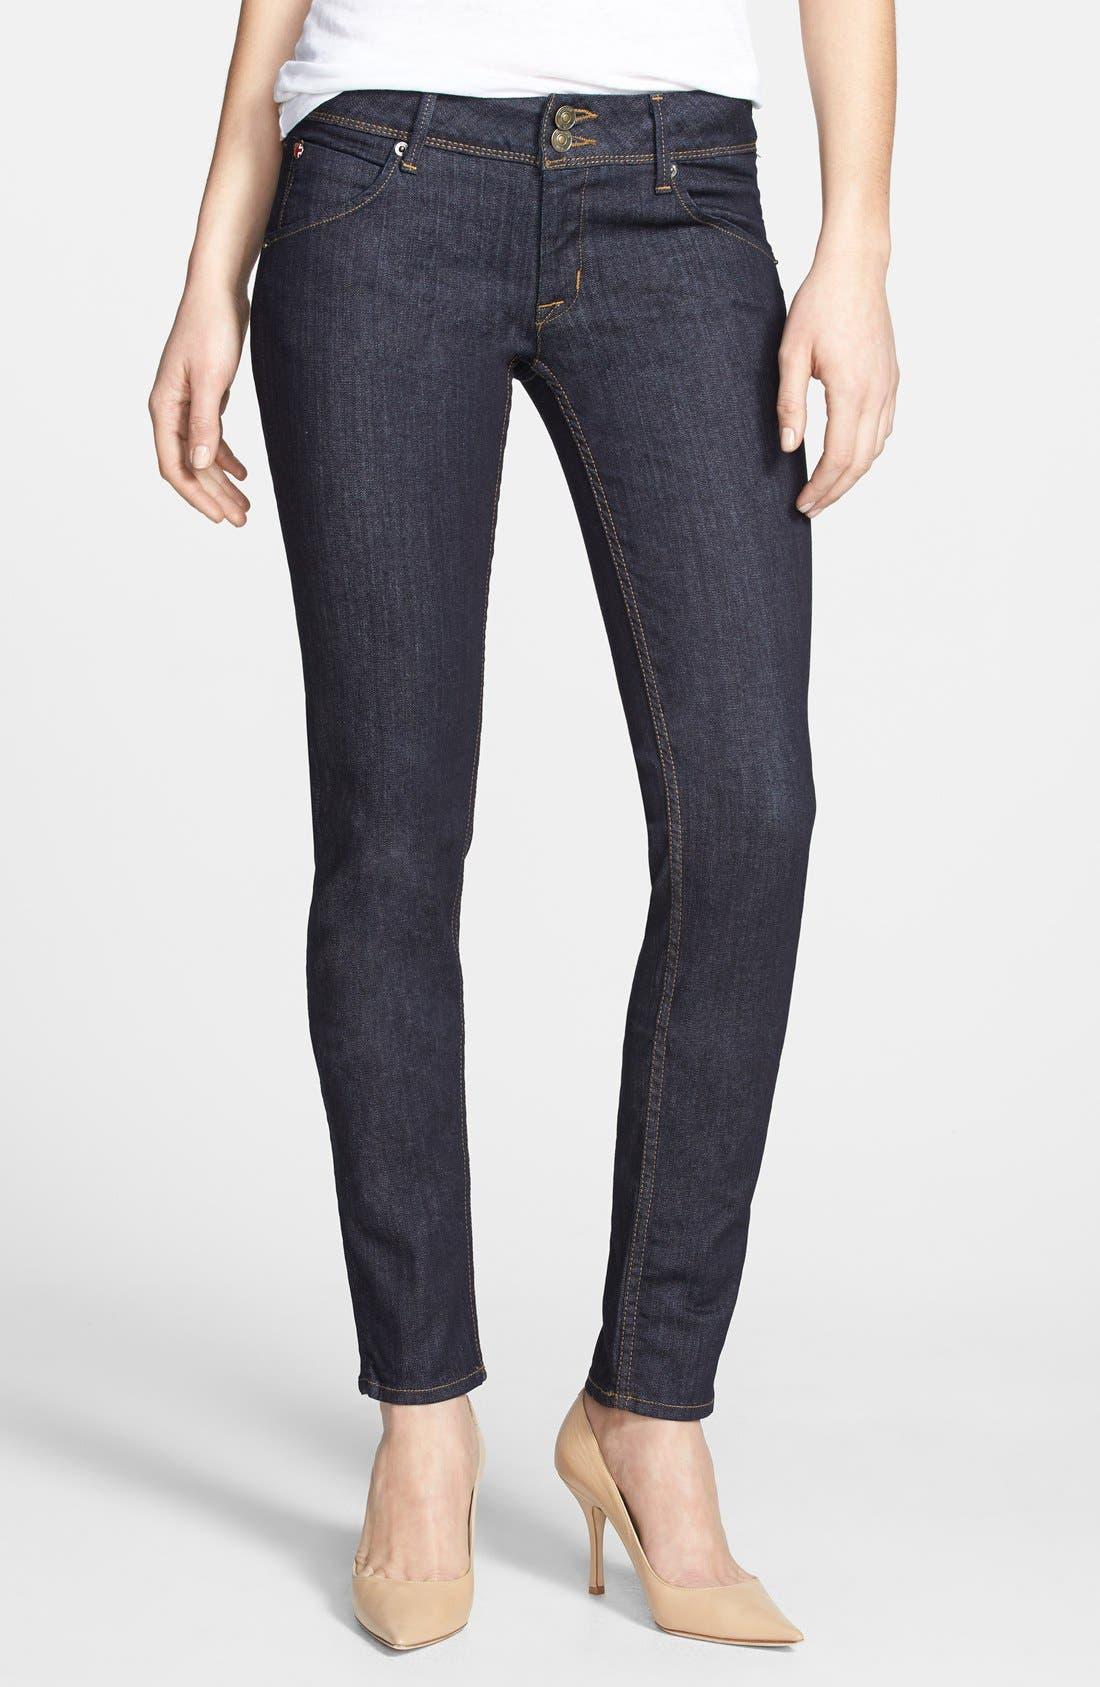 Main Image - Hudson Jeans 'Collin' Skinny Jeans (Foley)